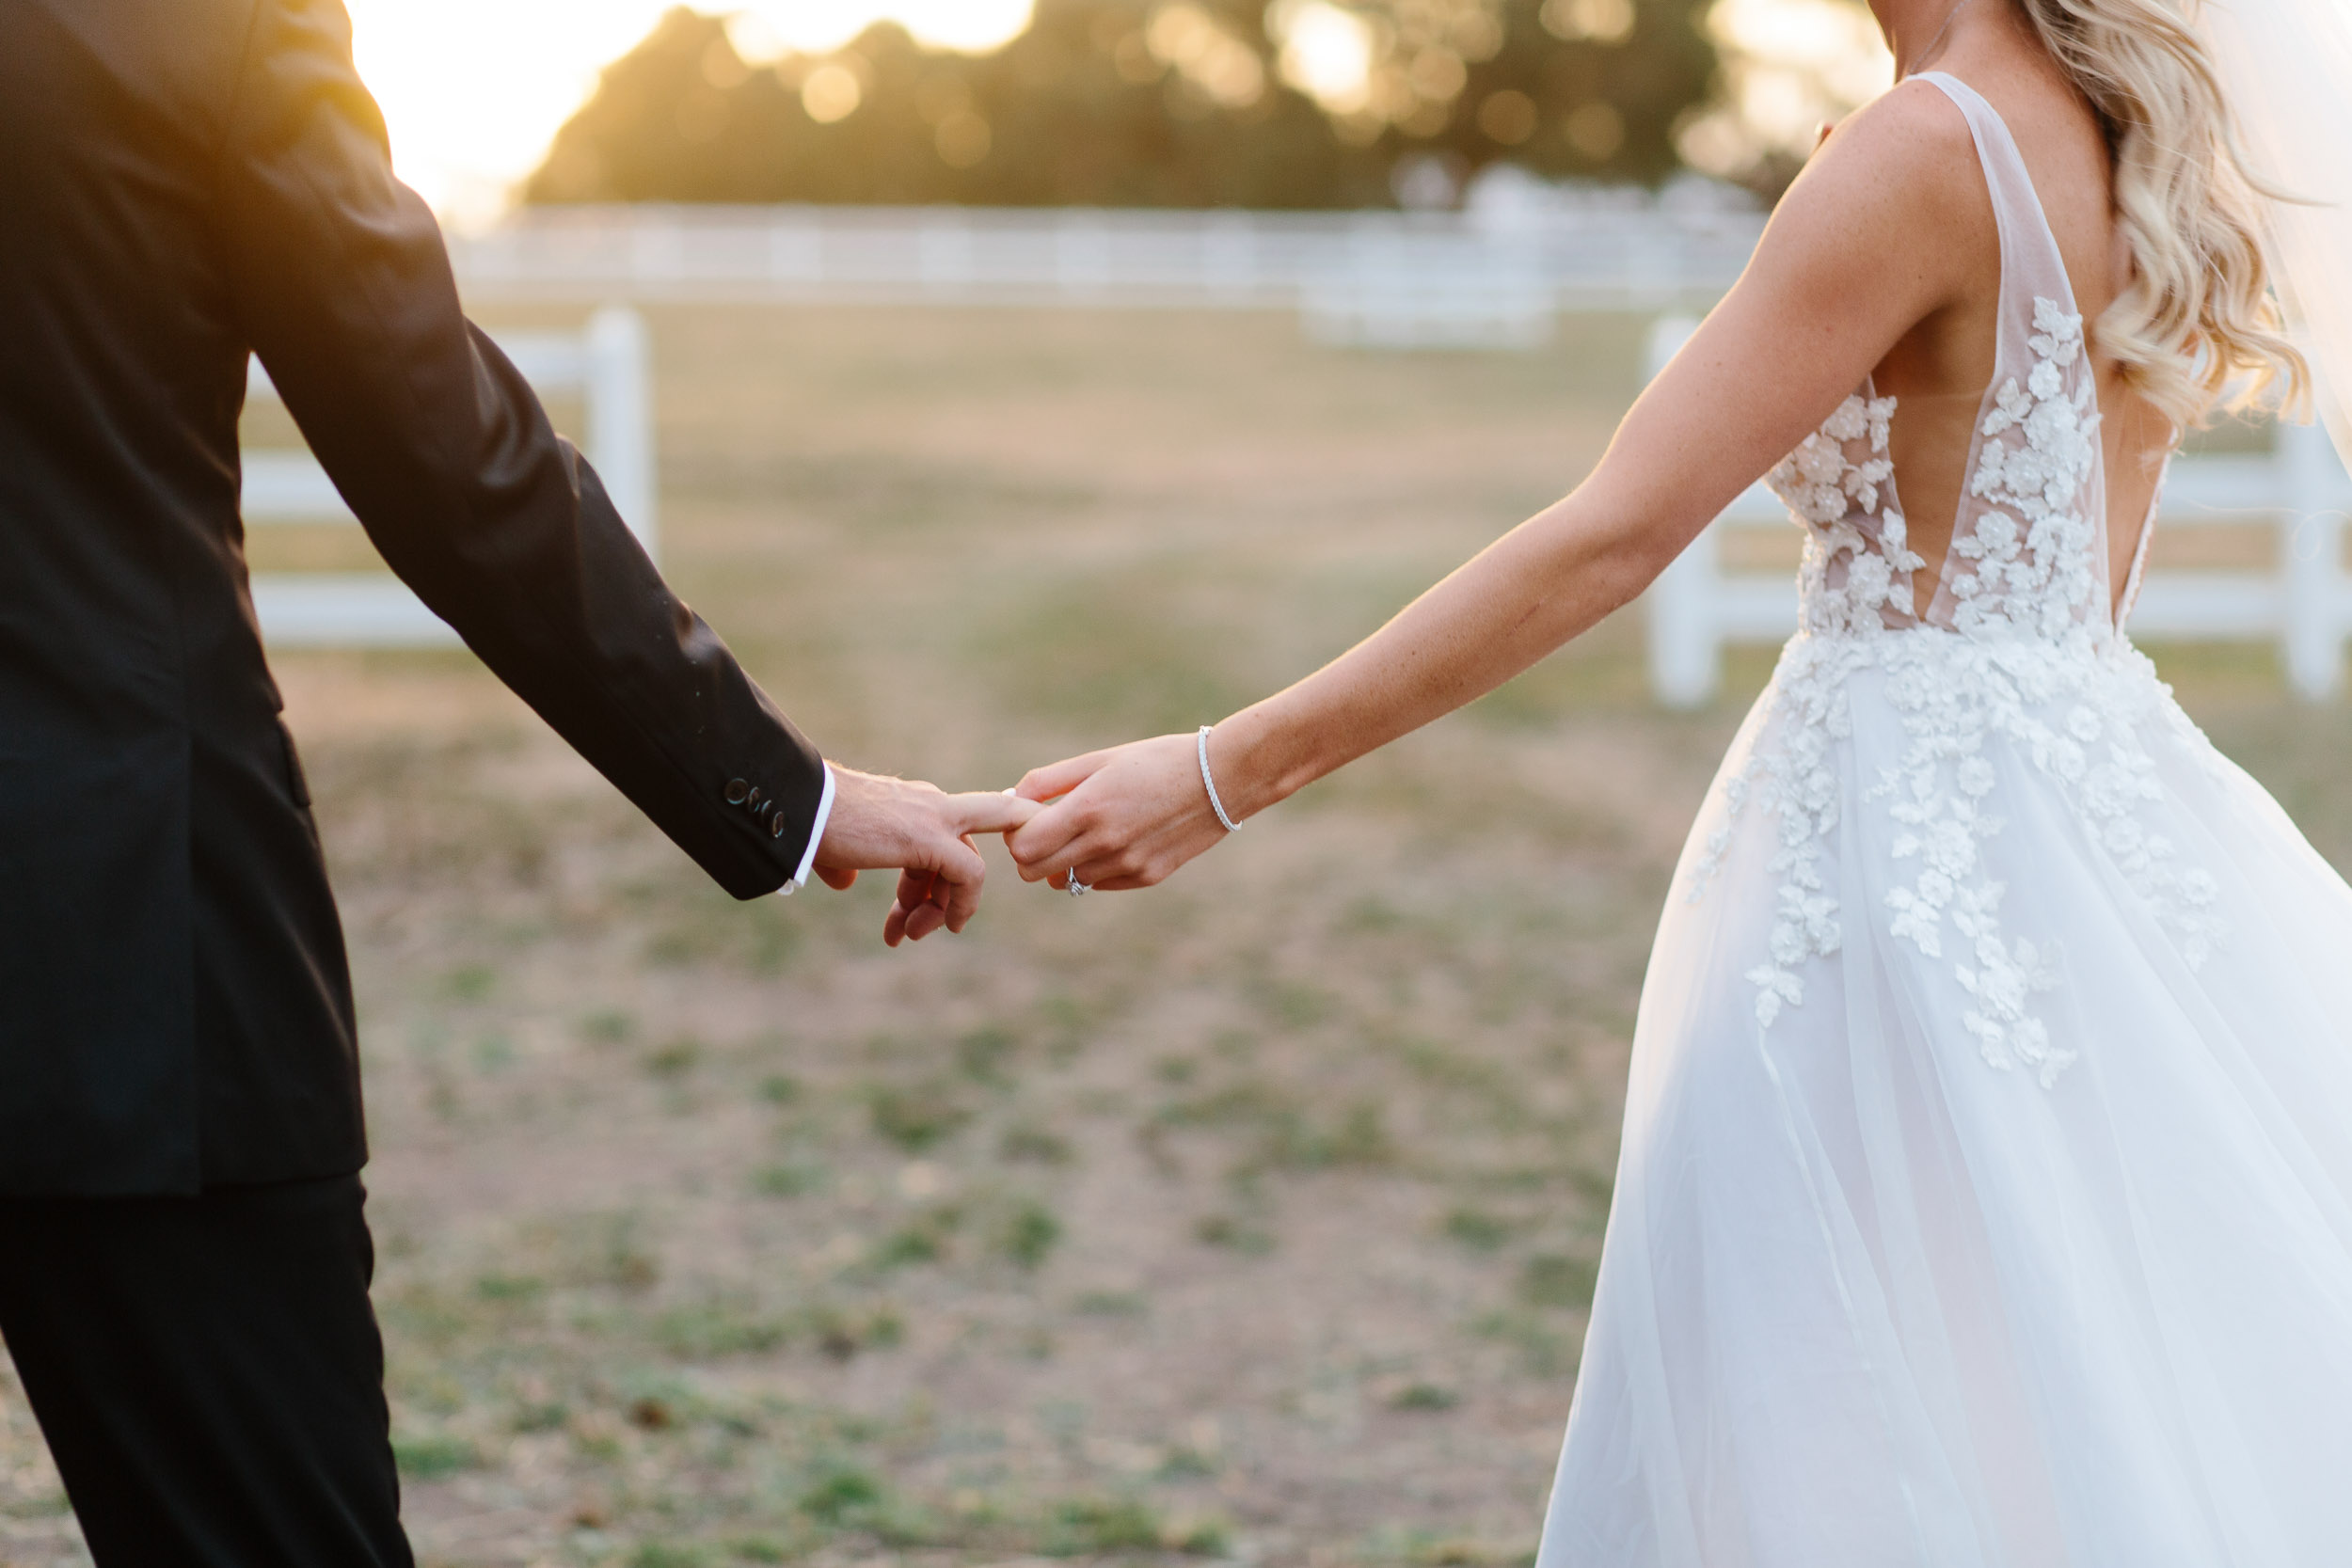 Kas-Richards-Mornington-Peninsula-Private-Property-Wedding-Marianna-Hardwick-Gown-699.jpg